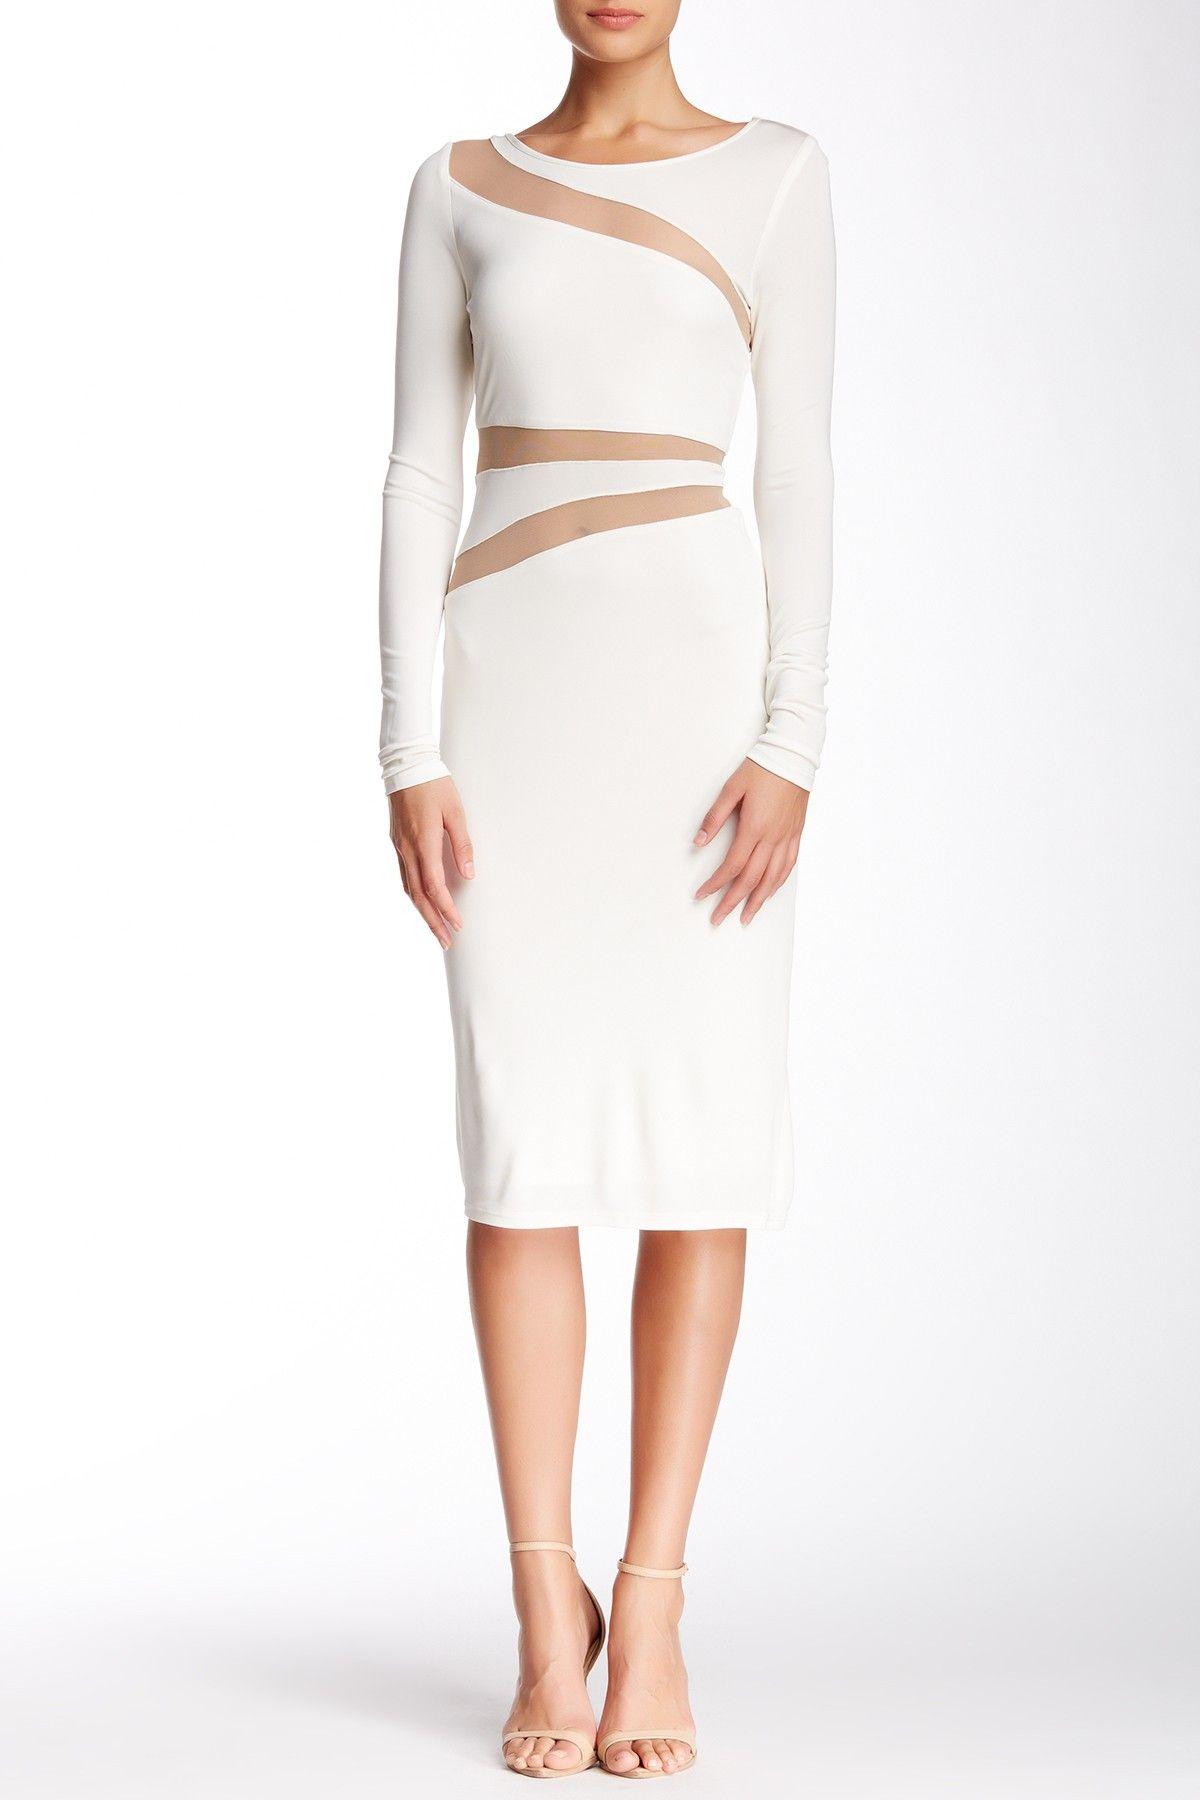 A B S By Allen Schwartz Mesh Inset Long Sleeve Dress Nordstrom Rack Social Dresses Womens Fashion Inspiration Nordstrom Dresses [ 1800 x 1200 Pixel ]